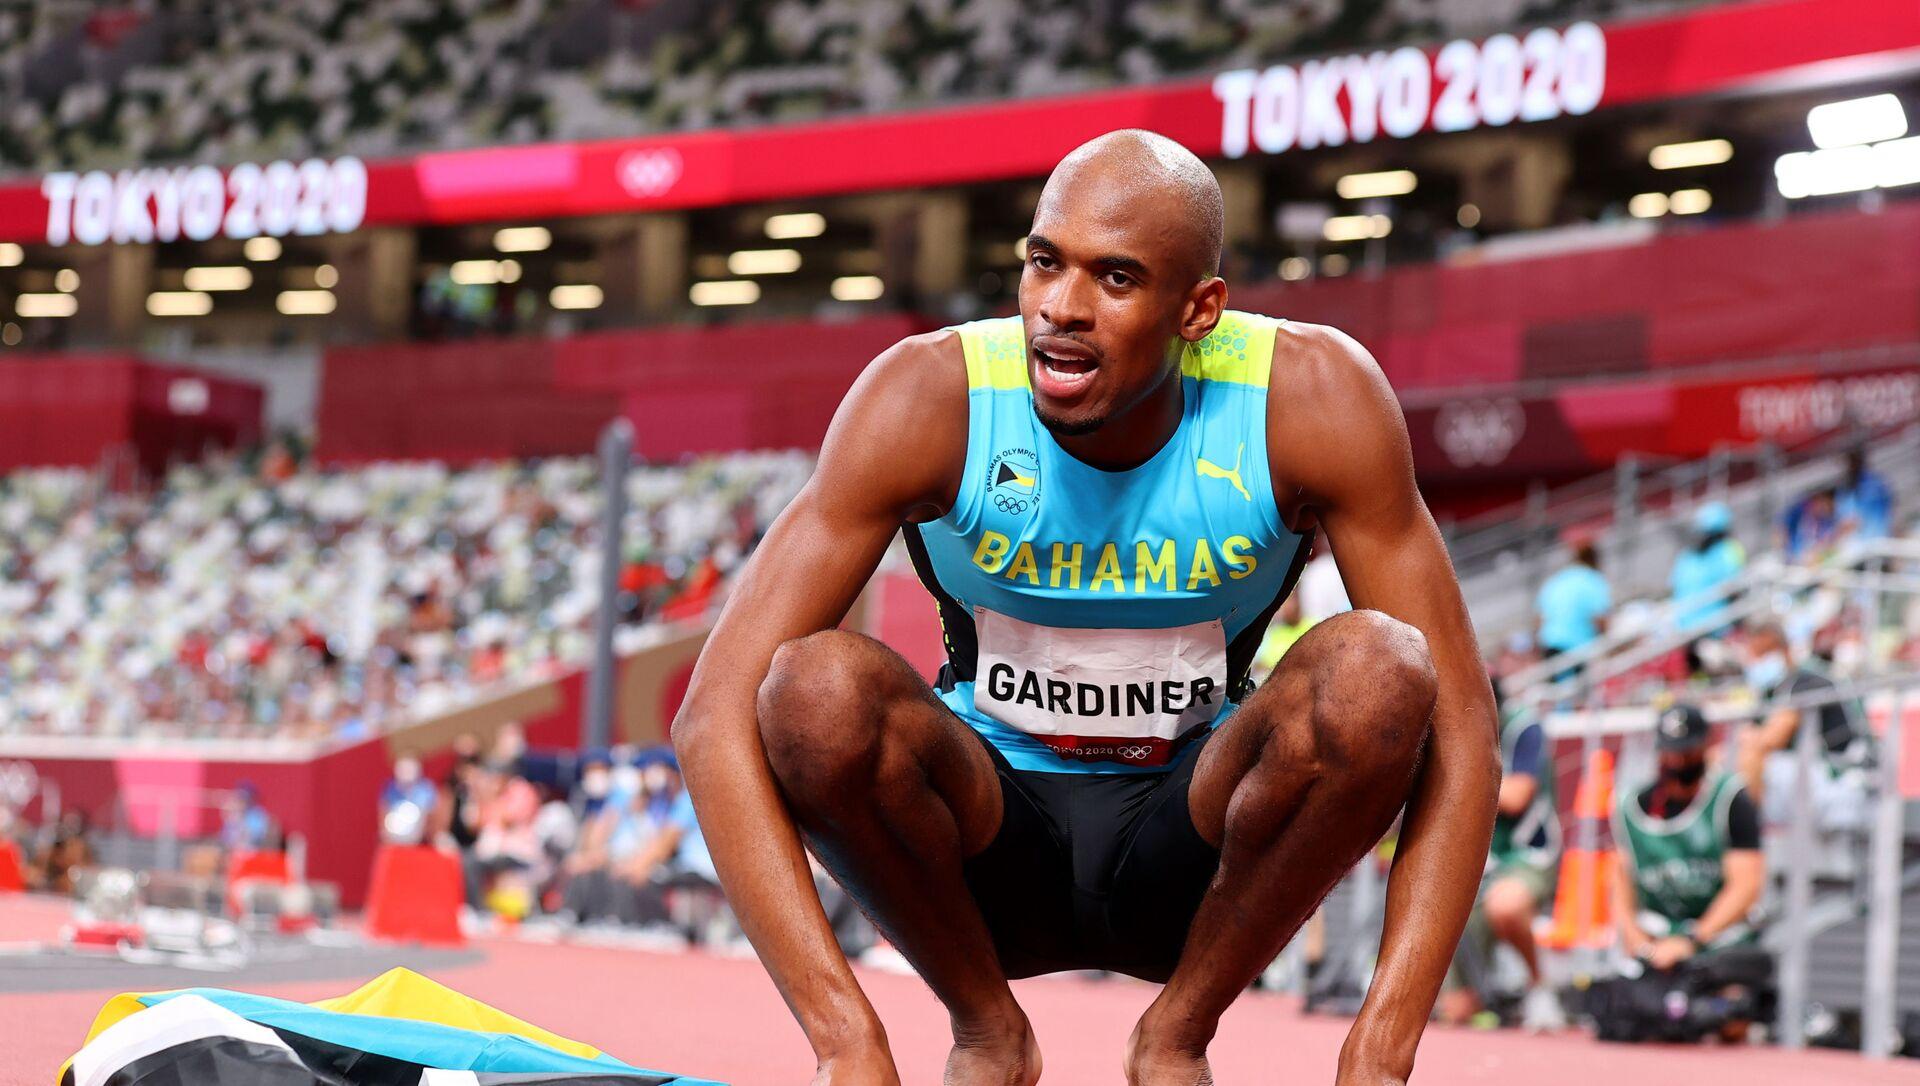 Gold medallist Steven Gardiner of the Bahamas reacts after the final  - Sputnik International, 1920, 05.08.2021